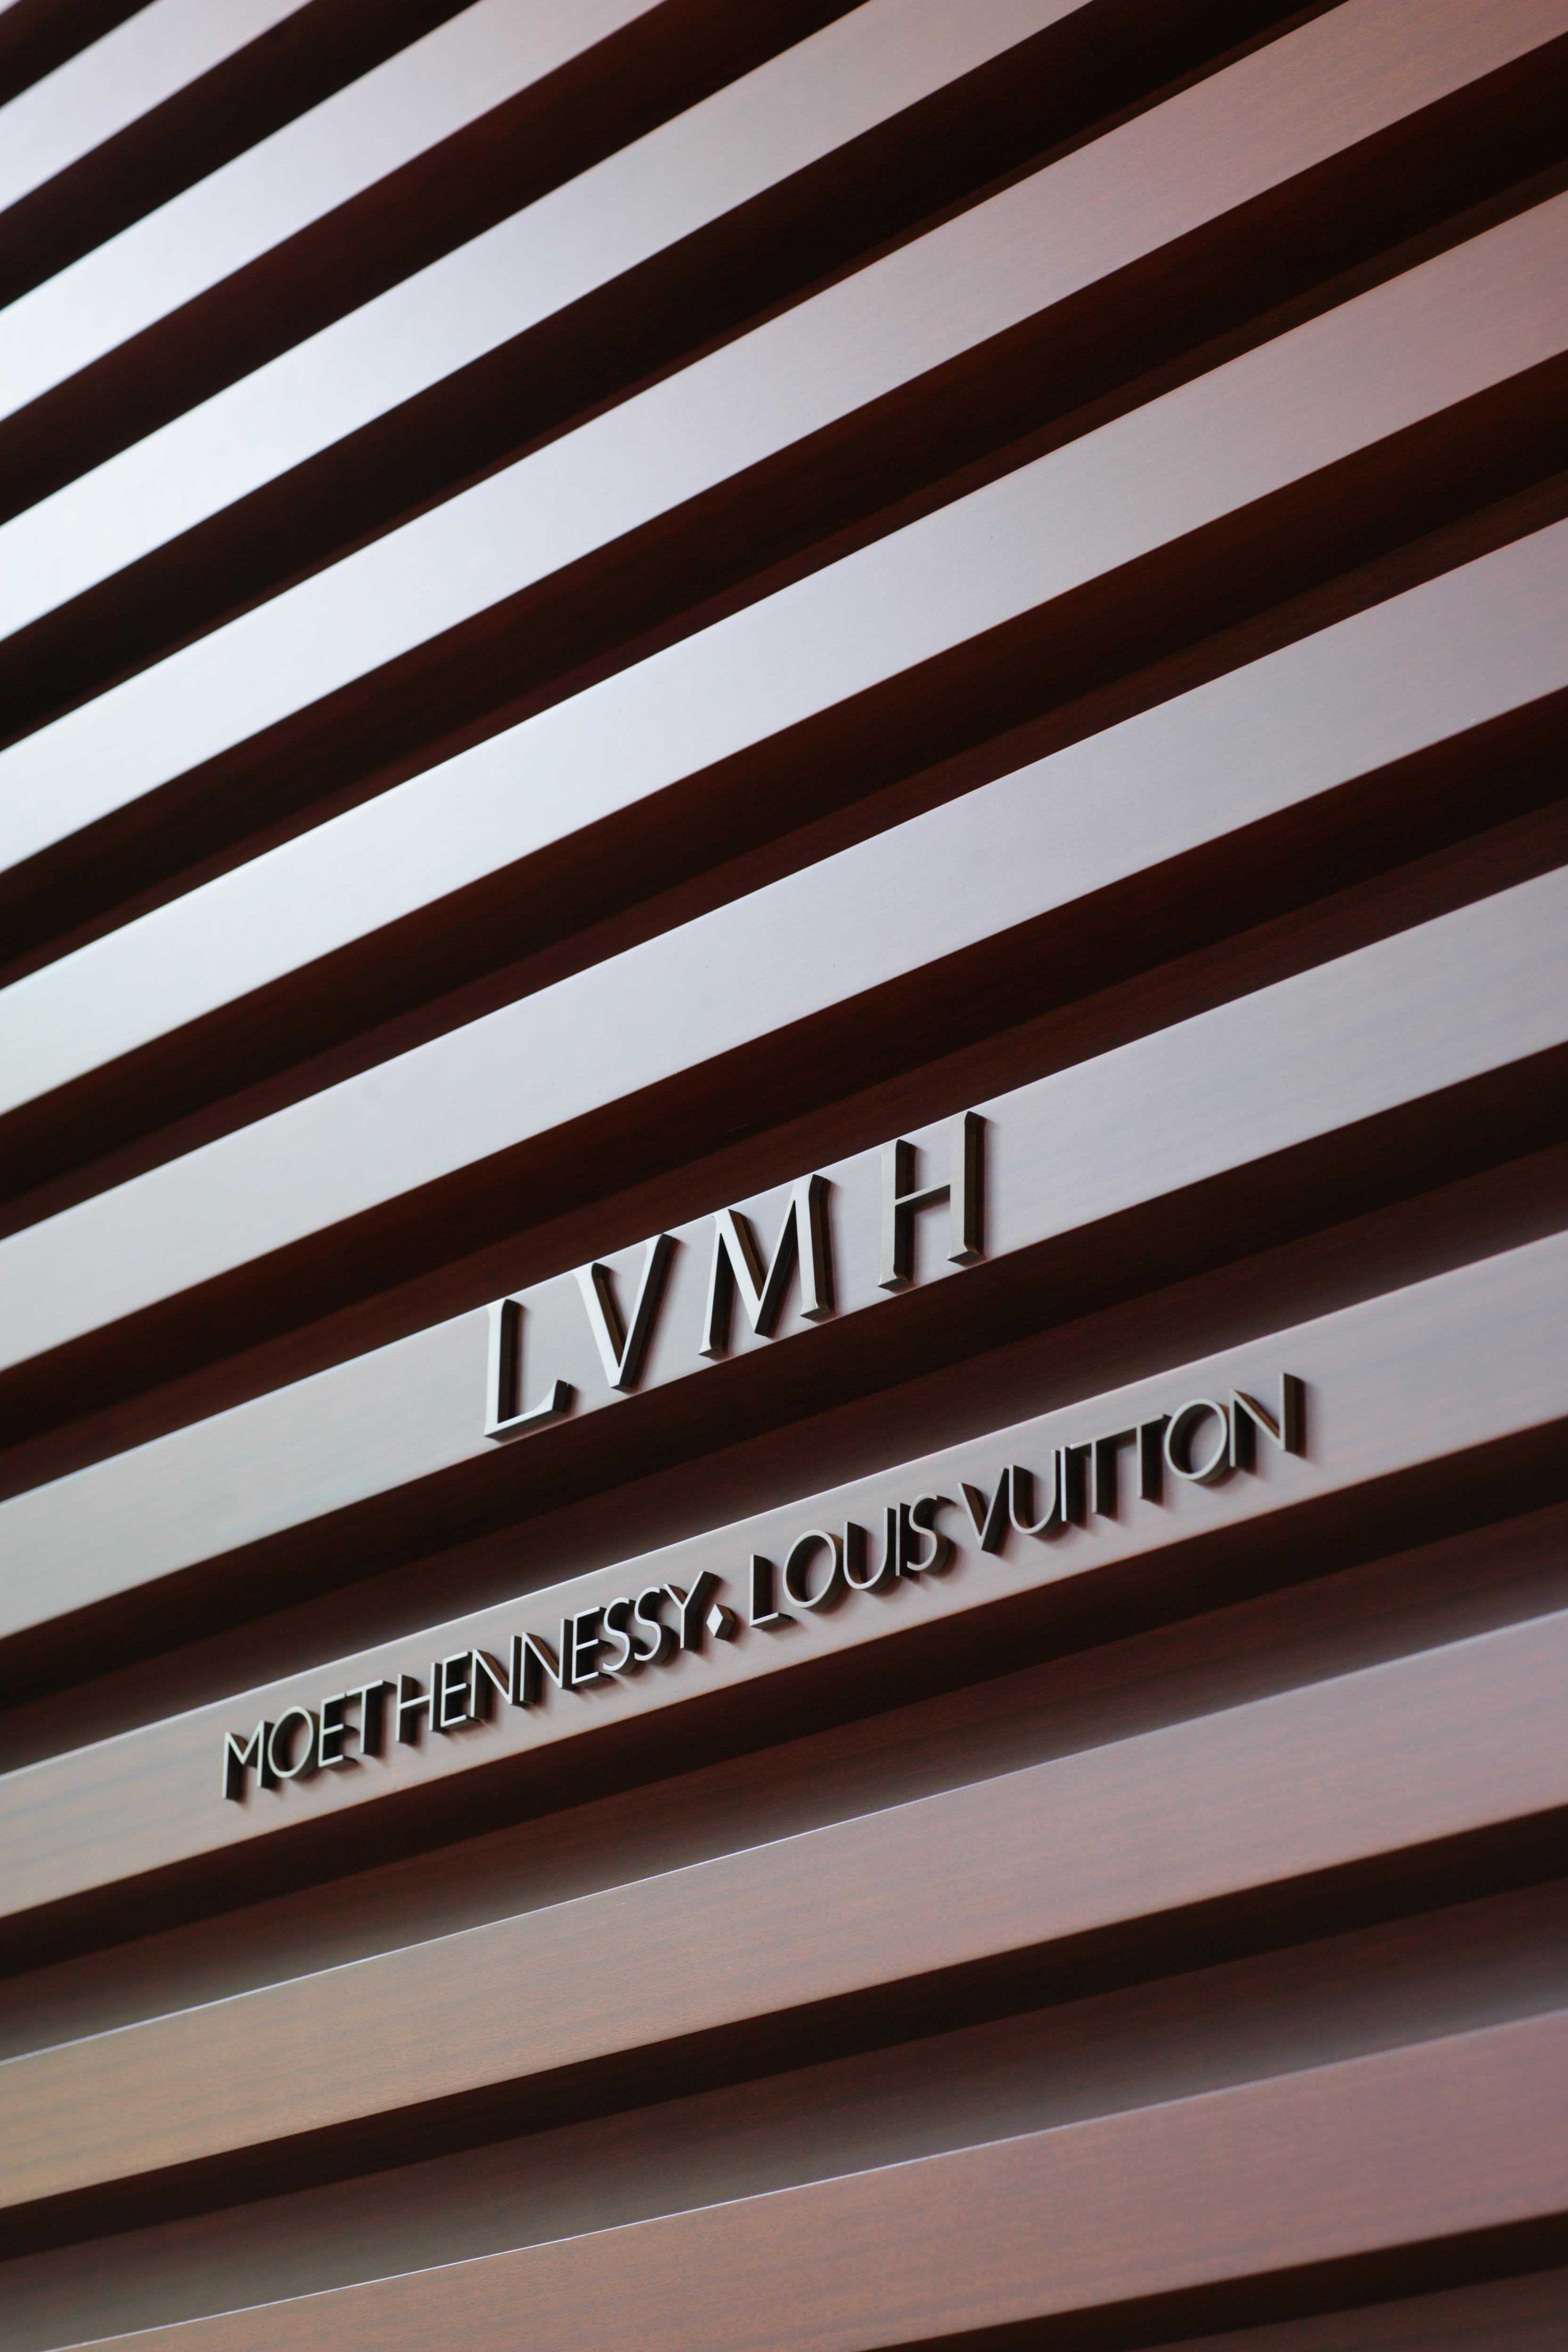 lvmh 1 strategy, organization & marketing project spring 2015 professor: paolo neirotti yashar taifeh – s201988 jennie boérius – s215711 elena boffi .